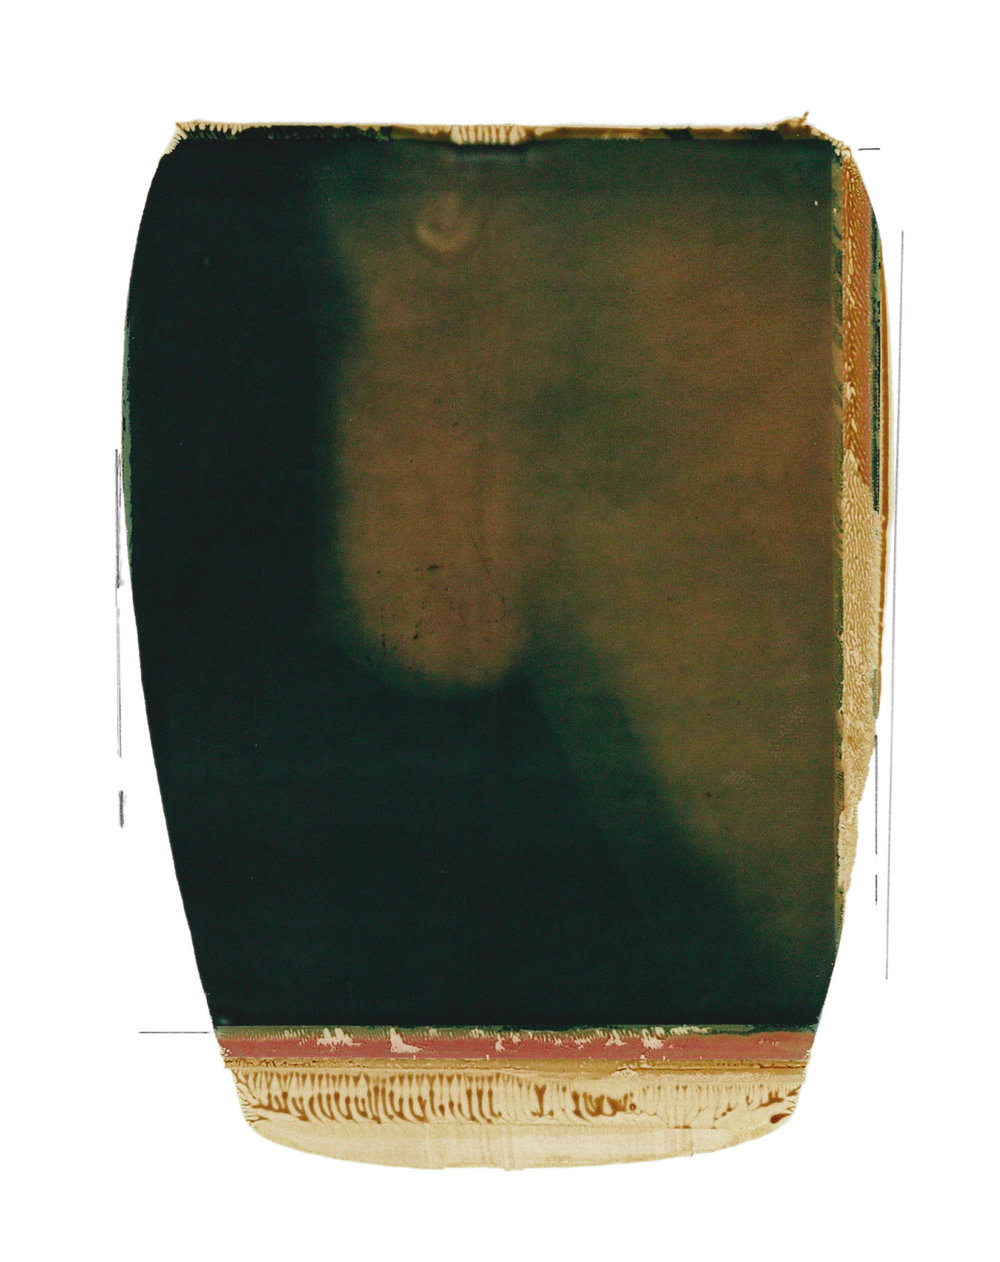 GIOLI_POLAROID 2004-61.png